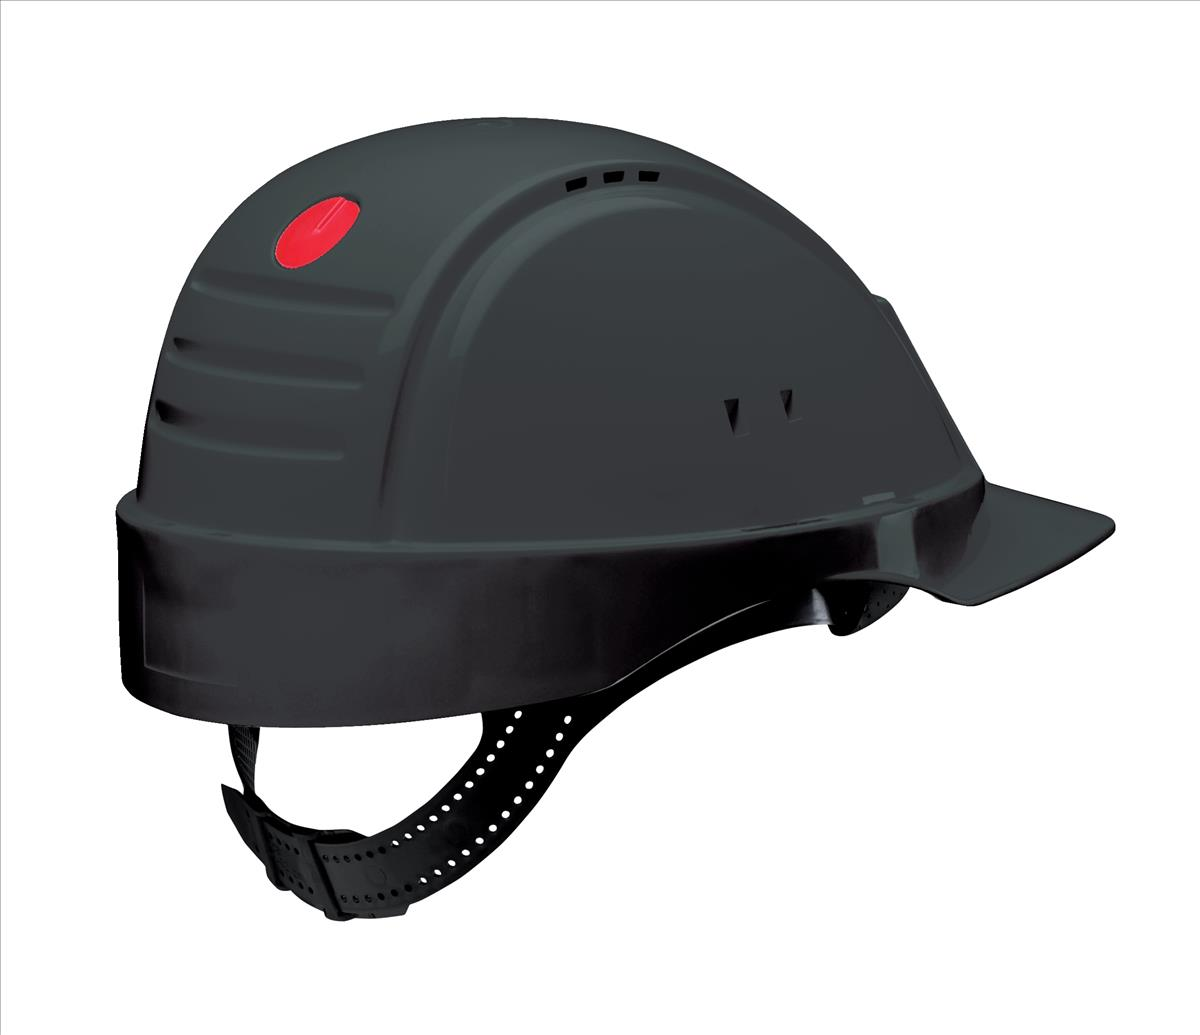 3M Solaris Saf Helmet Blue G2000CUV-BB